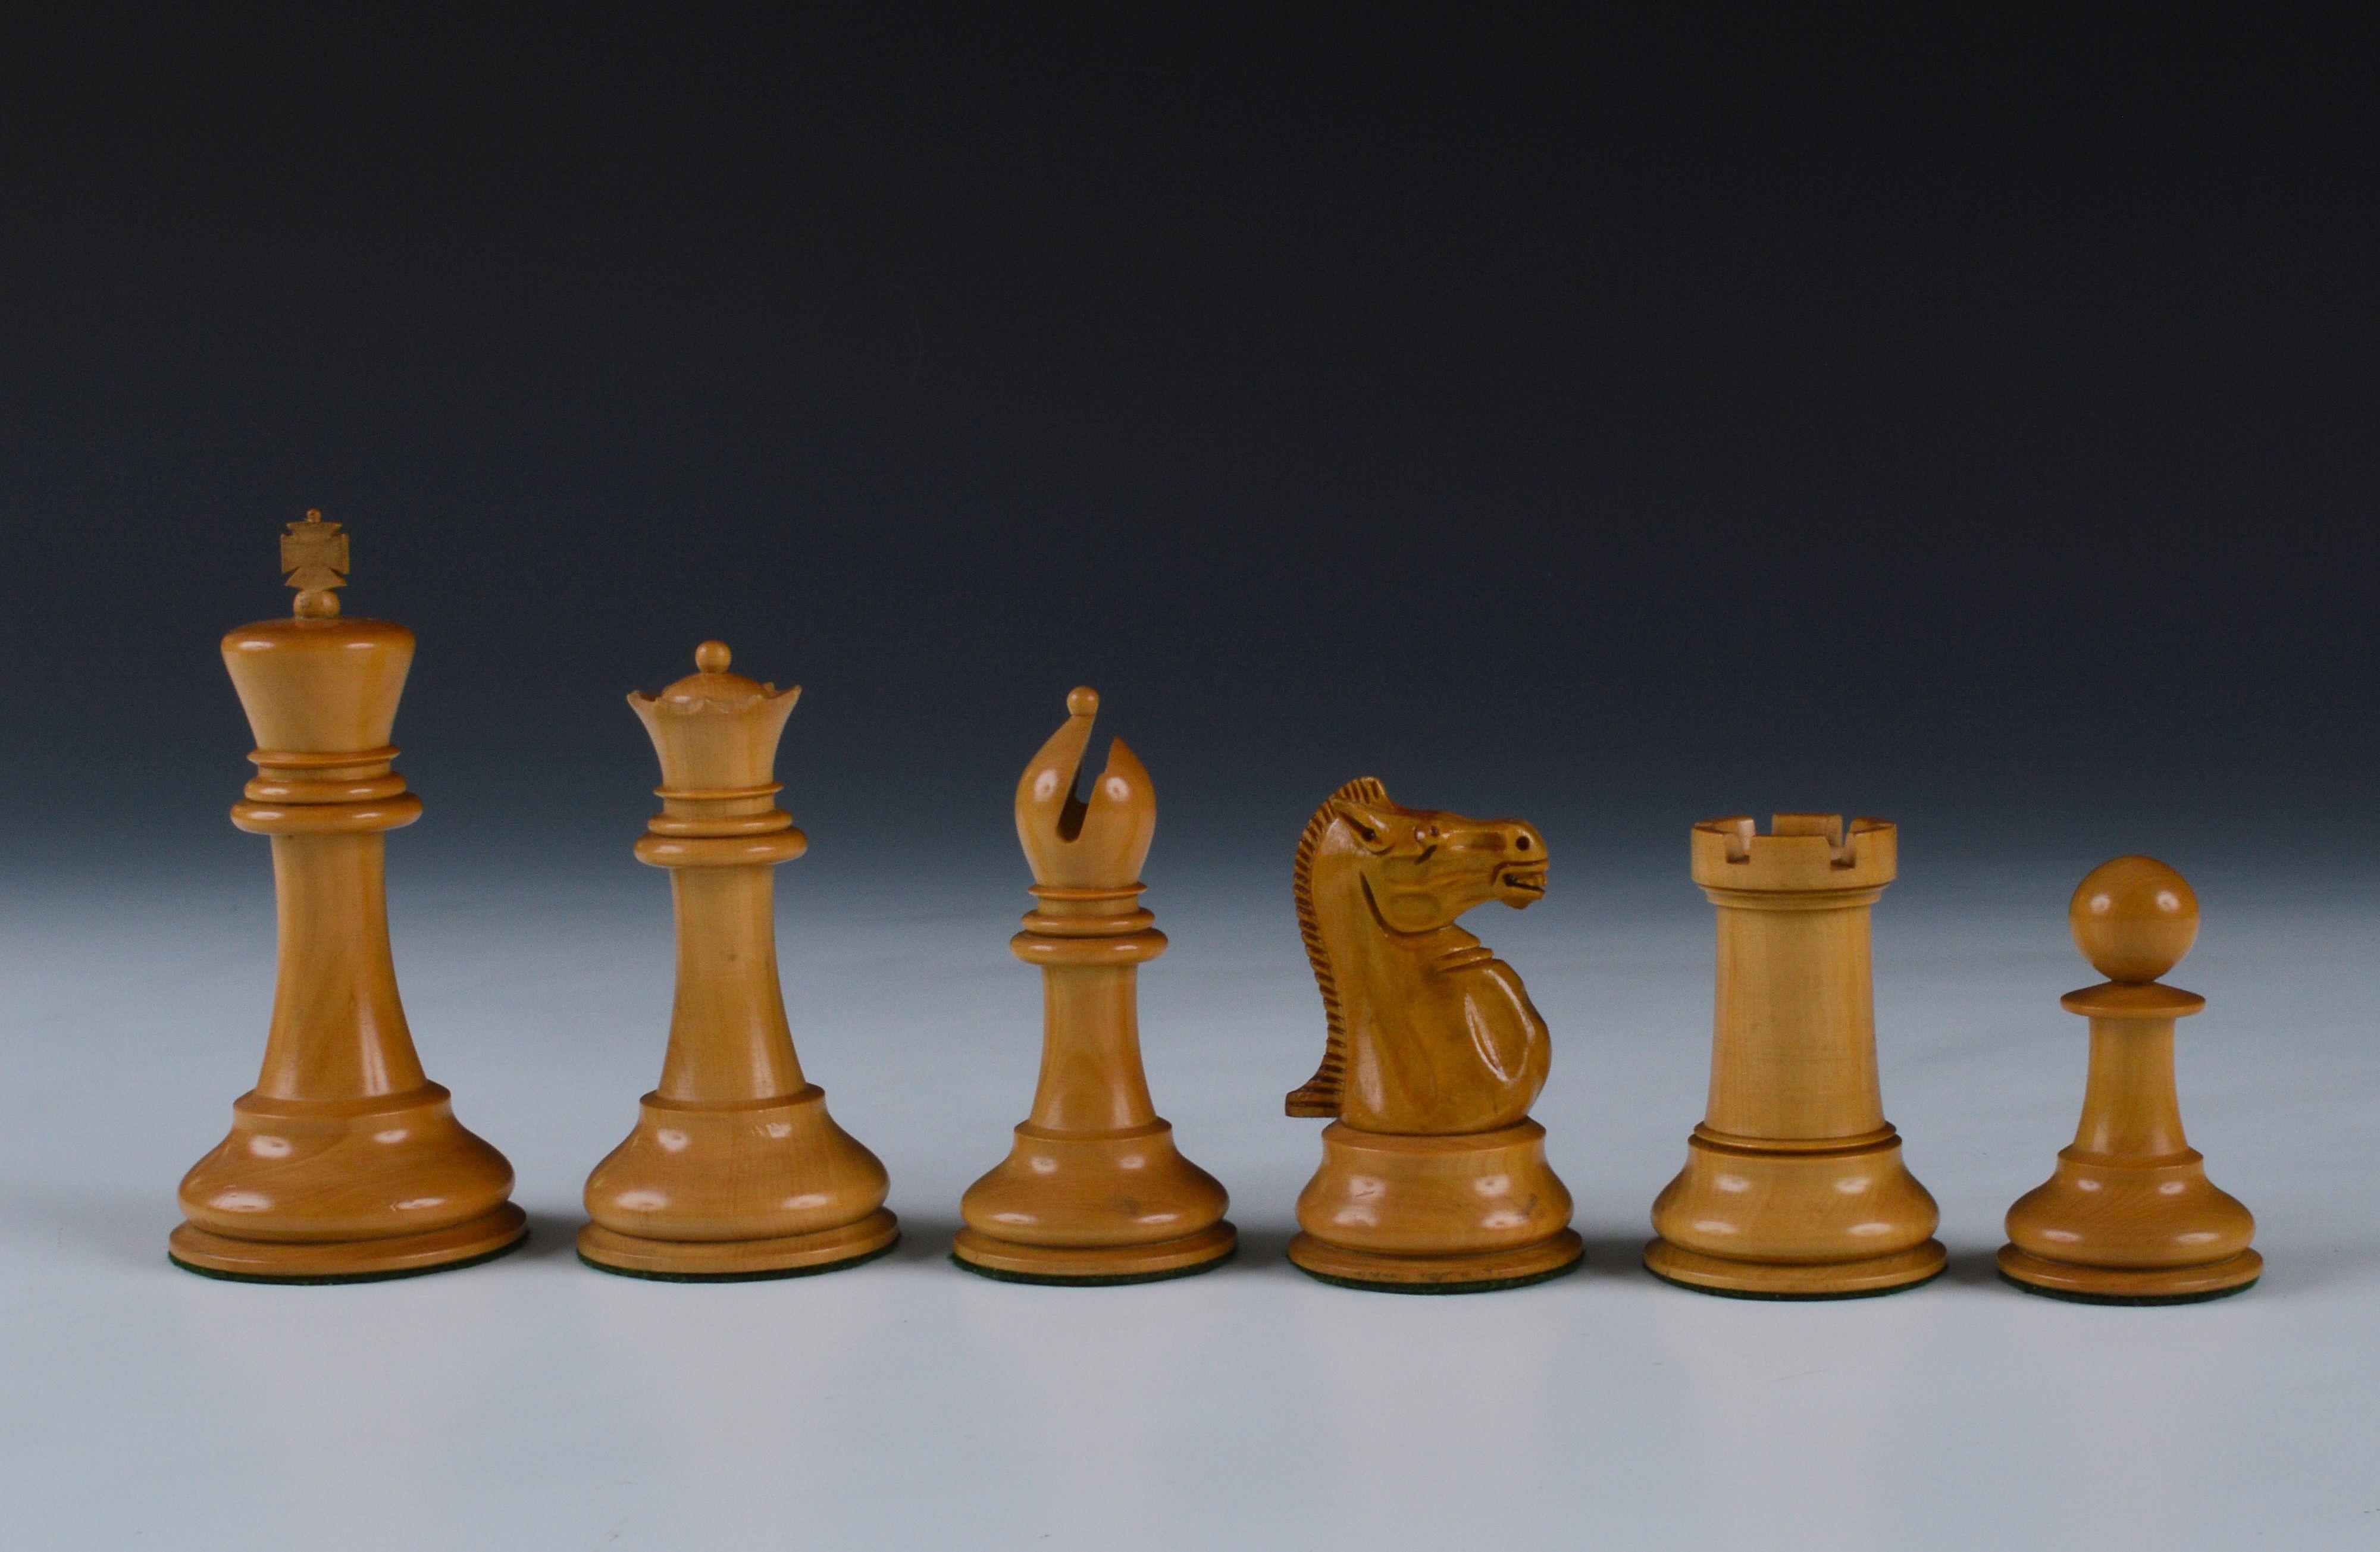 Dating staunton chess sets